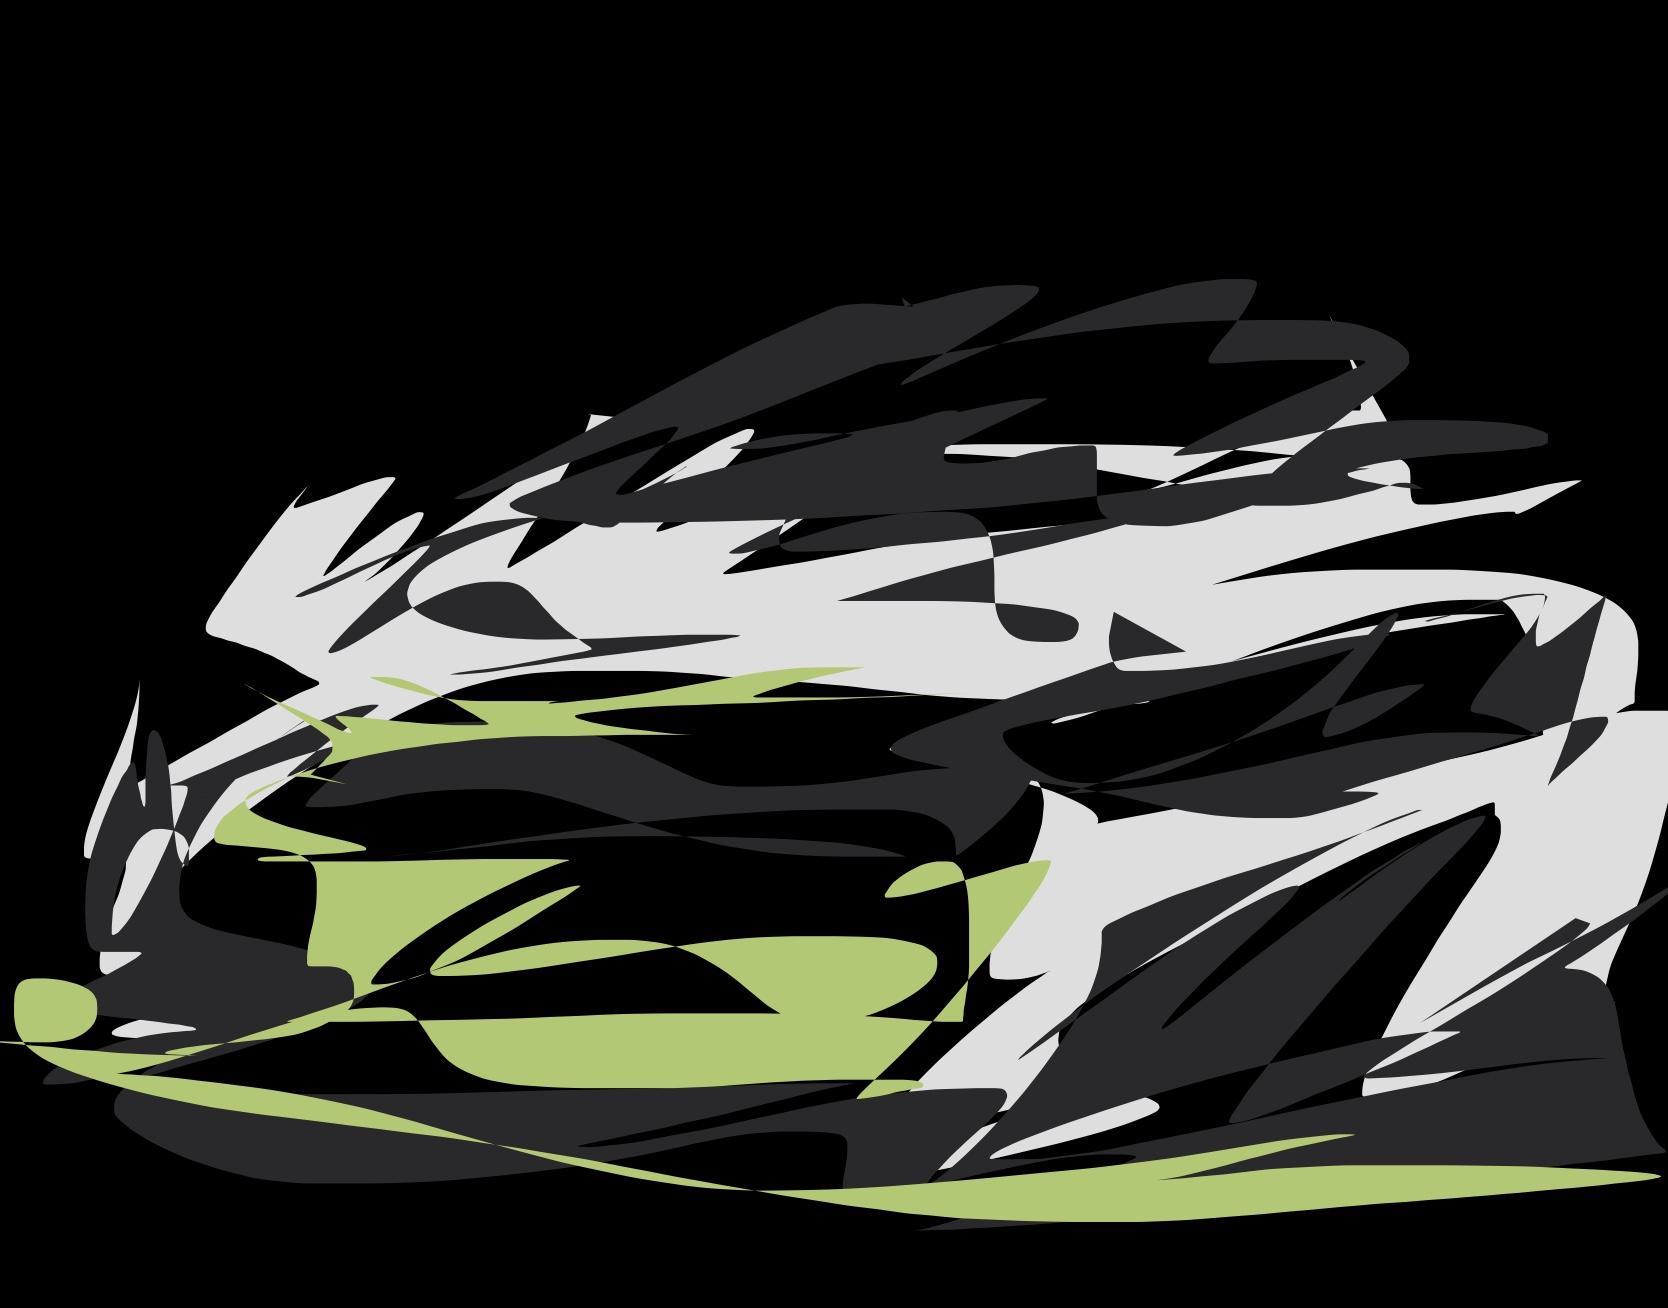 Audi abstract Eric Kim